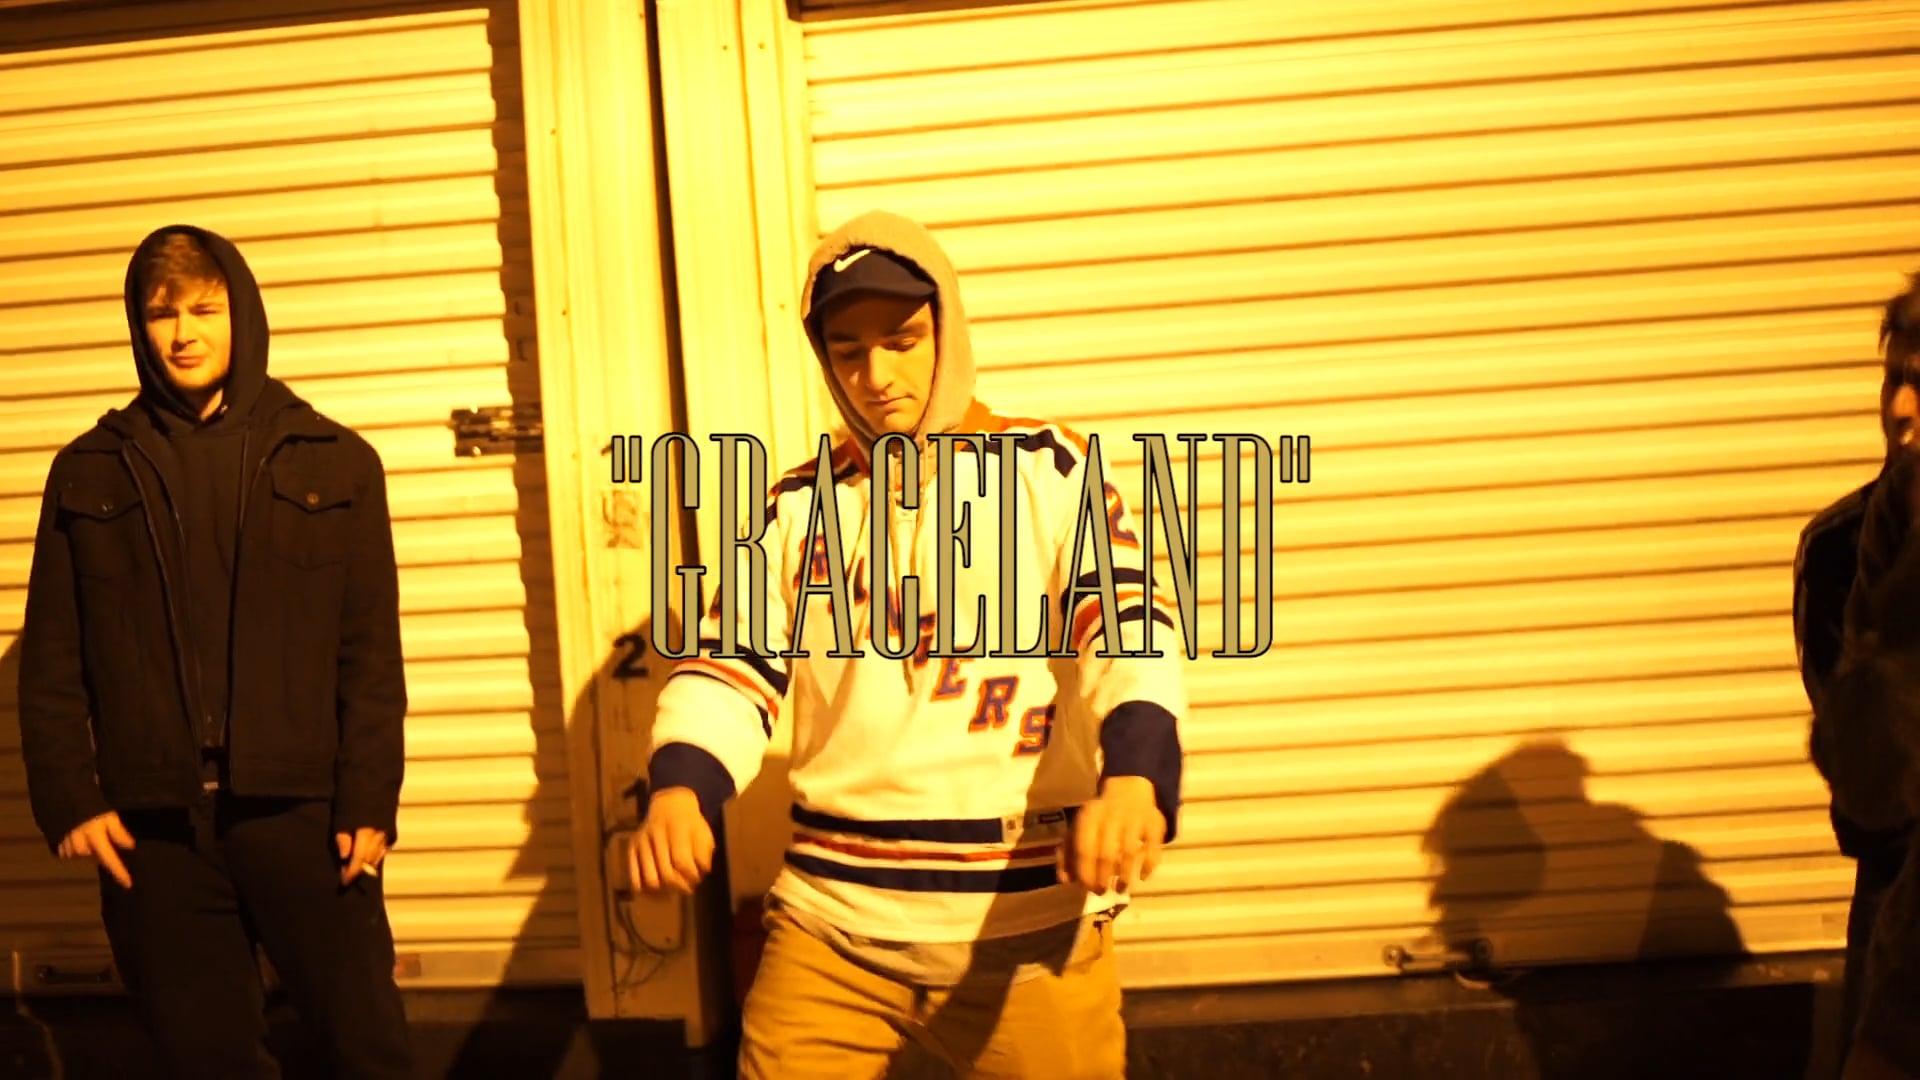 Bandit x Aarvee - Graceland (prod. Bandit) Music Video